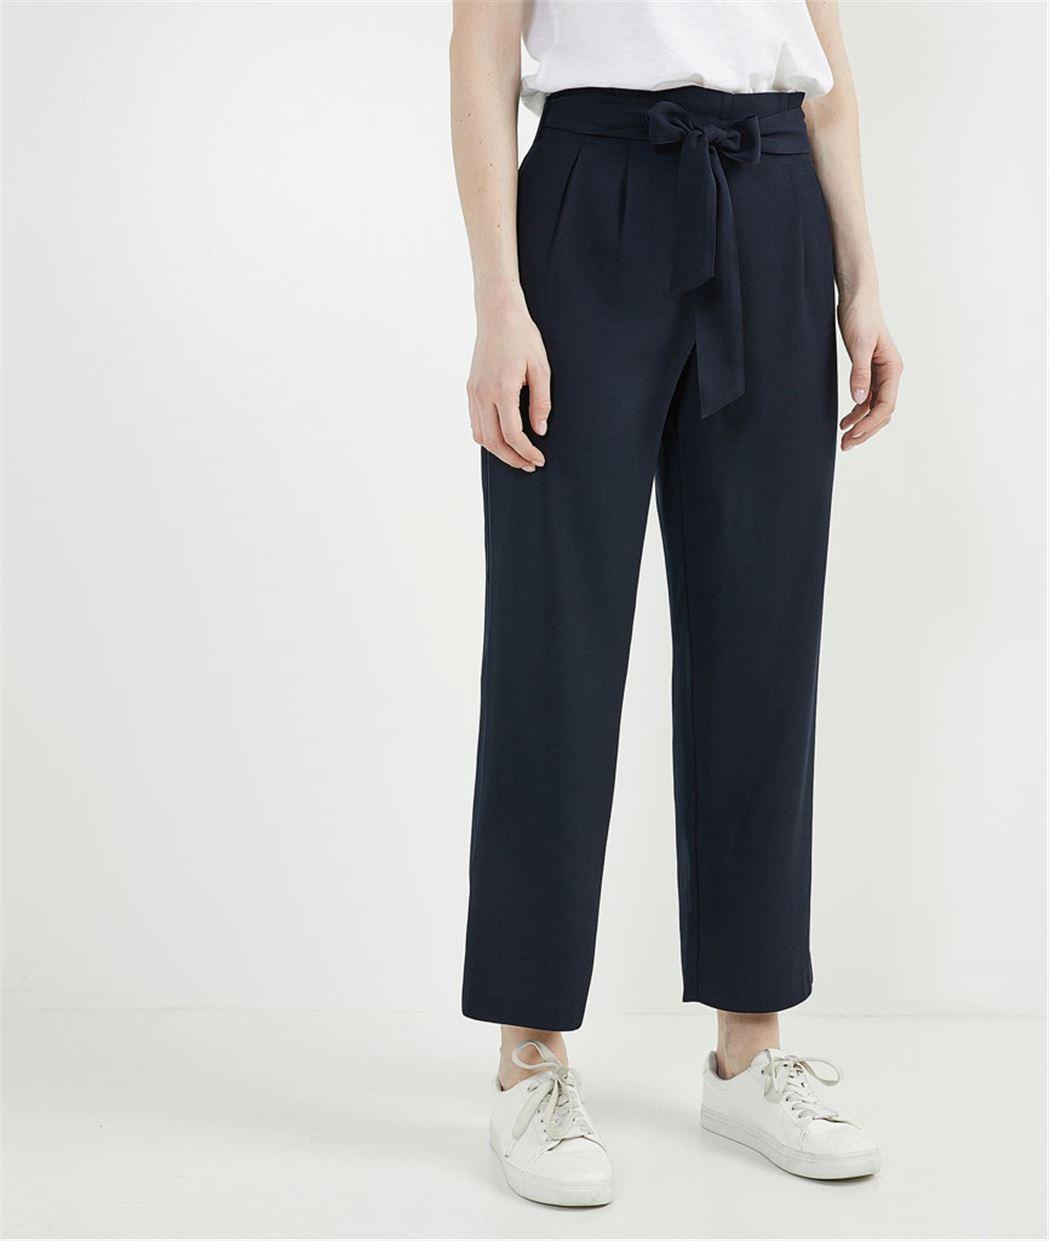 Pantalon femme paper bag MARINE